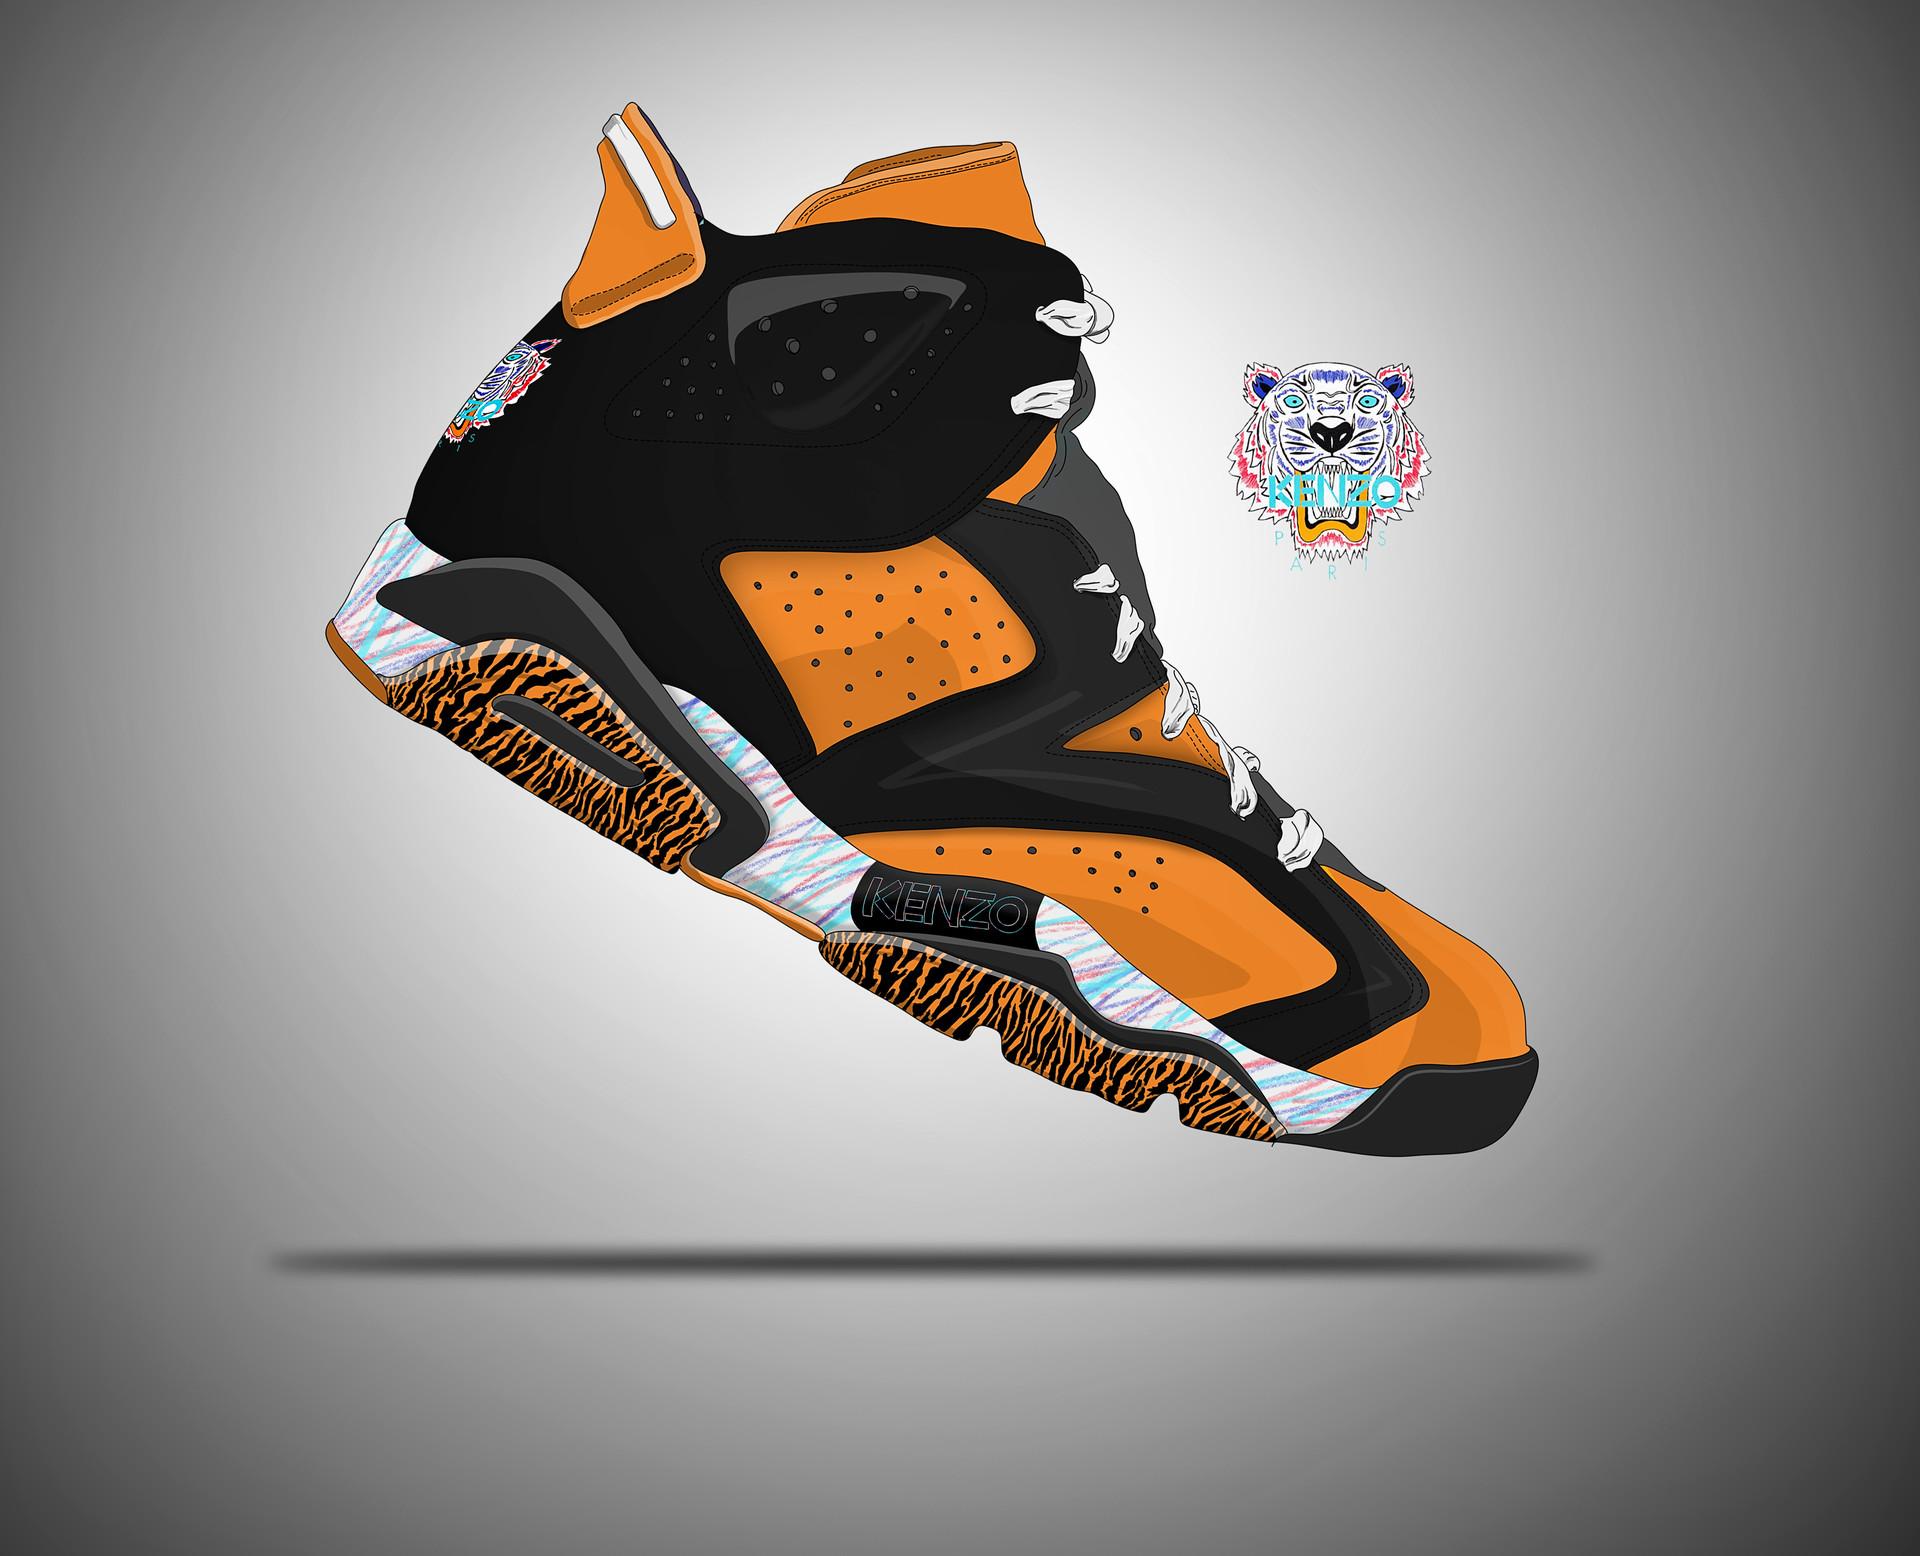 0d81771f ArtStation - Kenzo x Nike Air Jordan 6 Tiger kickz, Roman Bidnyy